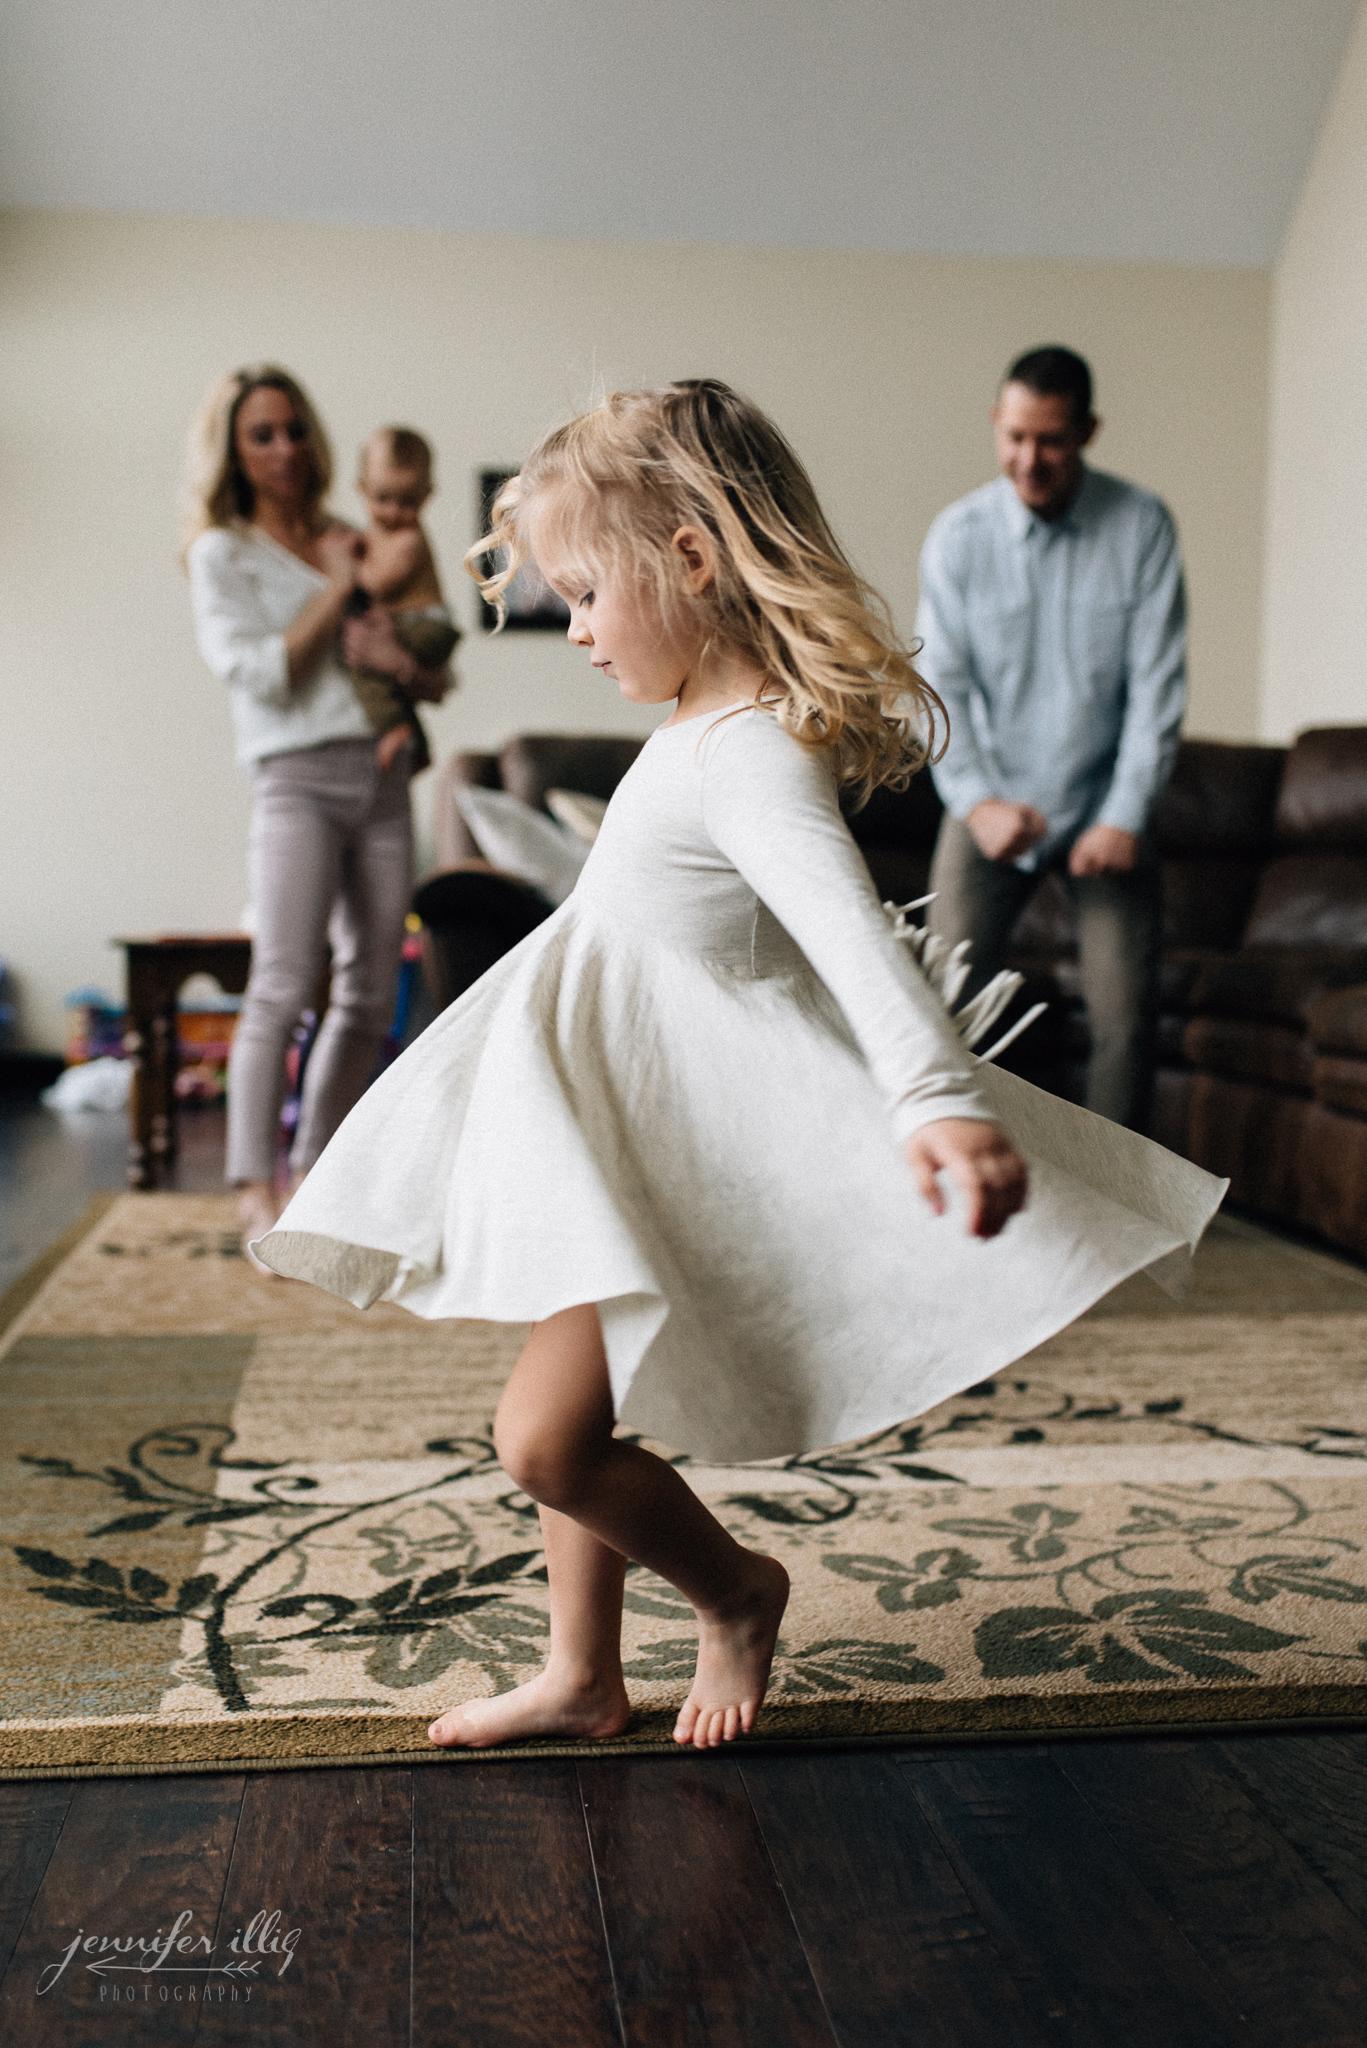 MagpieCo twirl dress